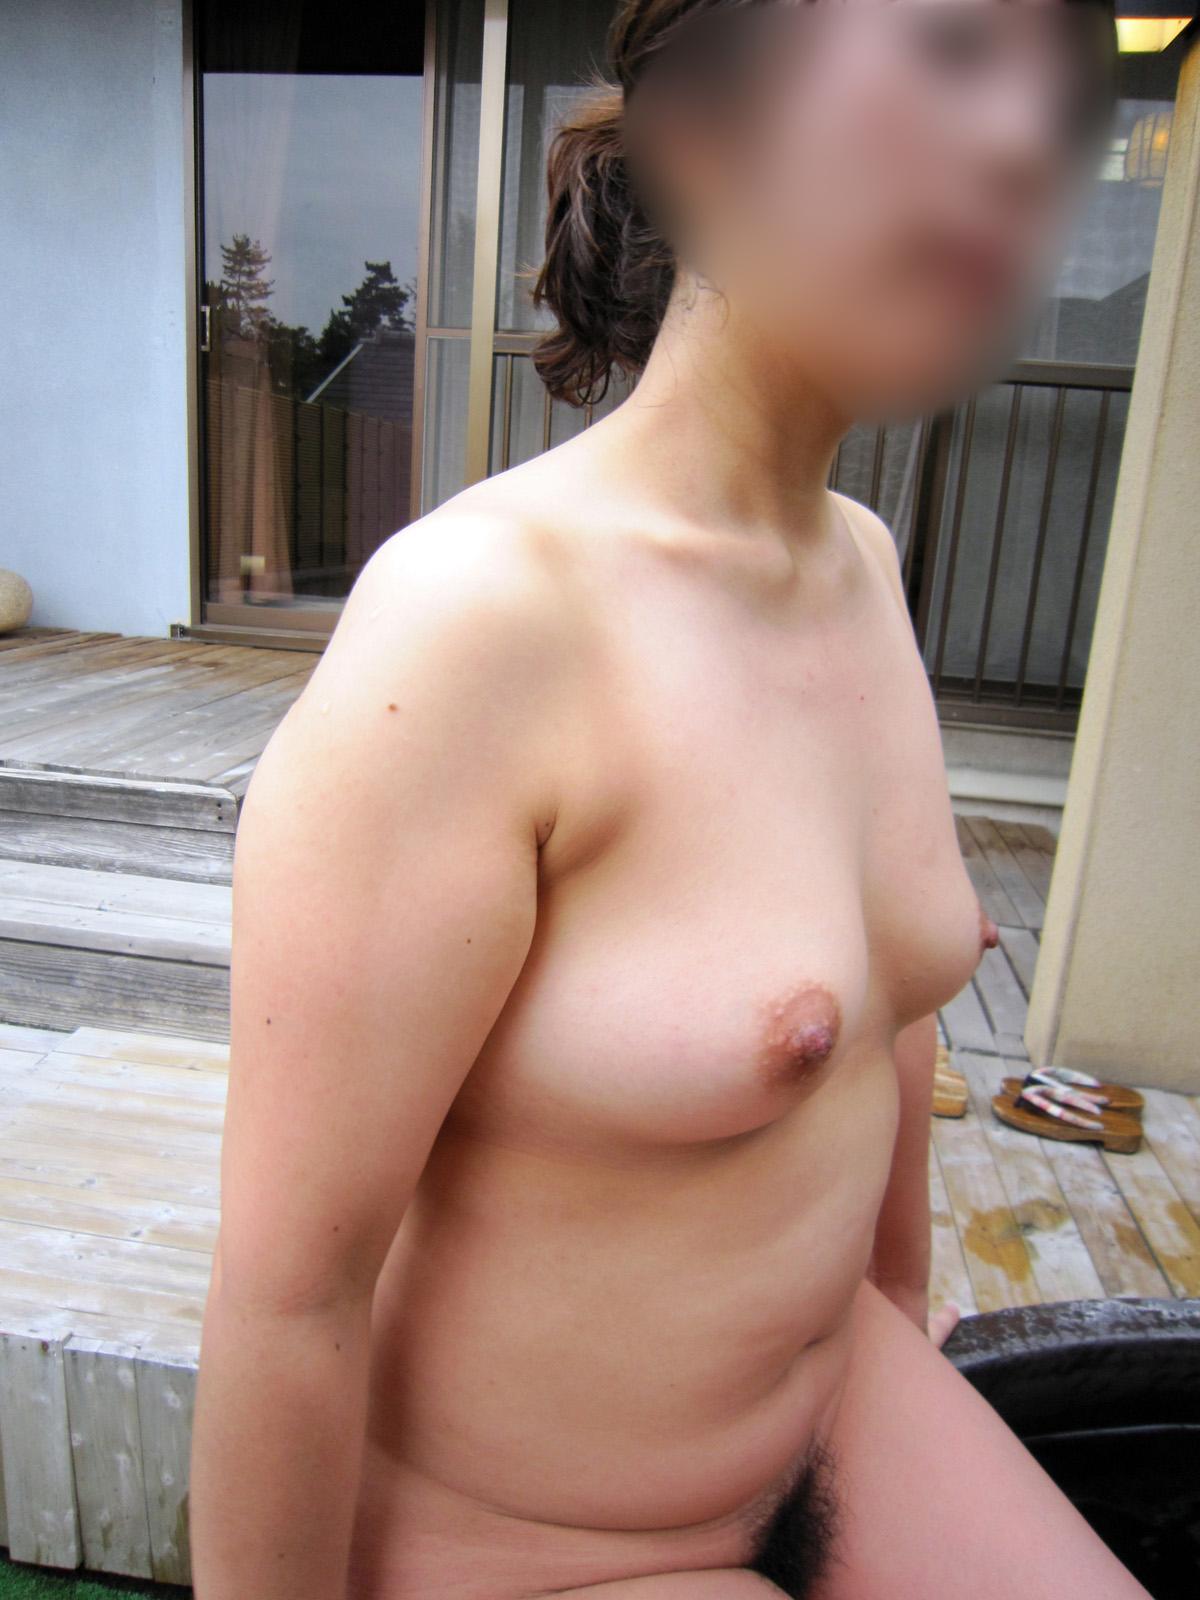 人妻 熟女 温泉 露天風呂 エロ画像【12】